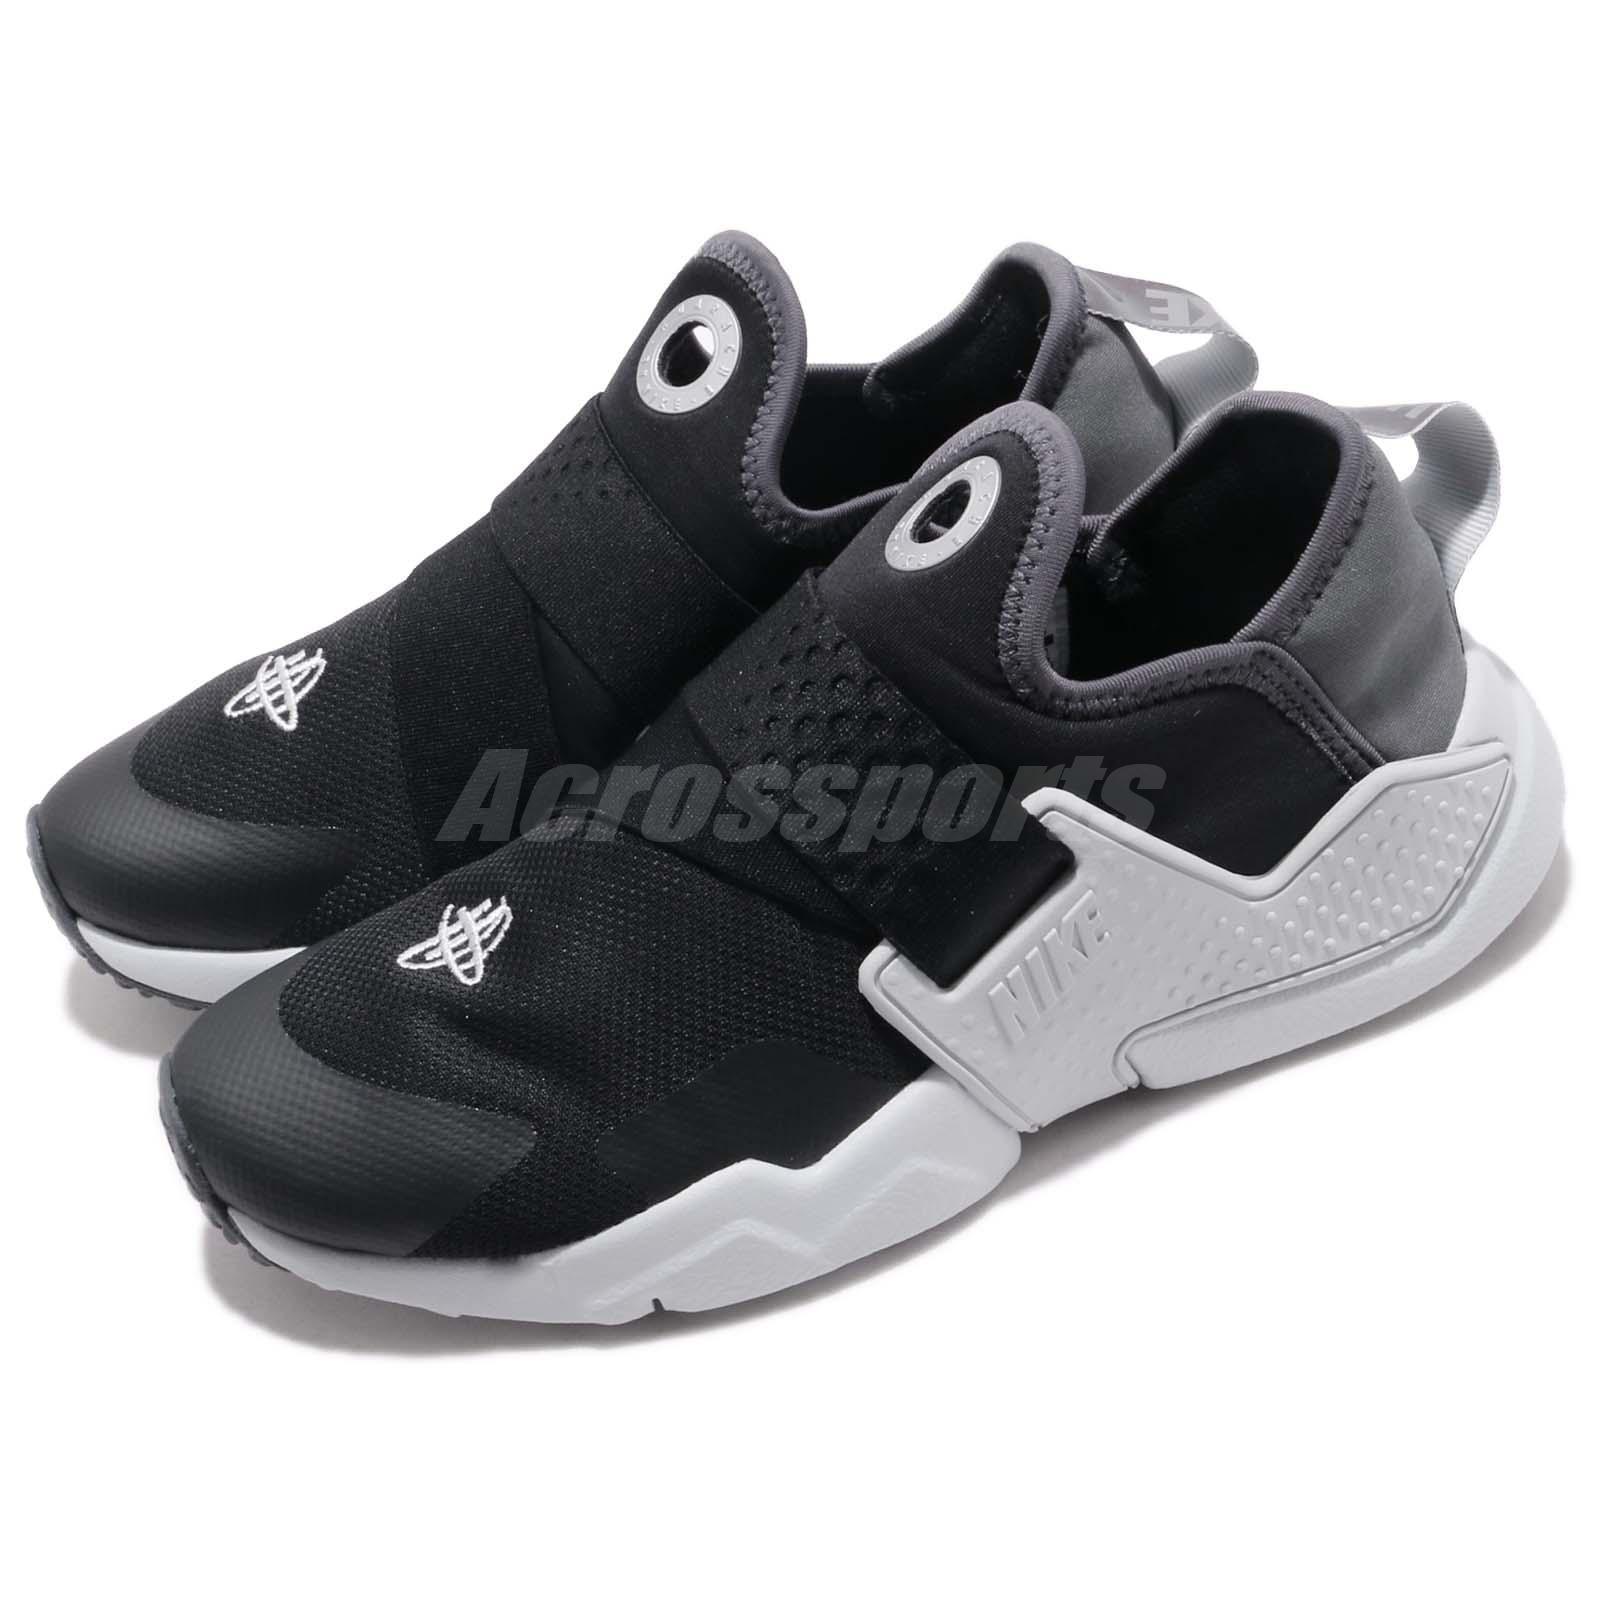 133e8f1992a23 Details about Nike Huarache Extreme SE GS Black Silver Grey Kid Women Slip  On Shoes AQ7936-002